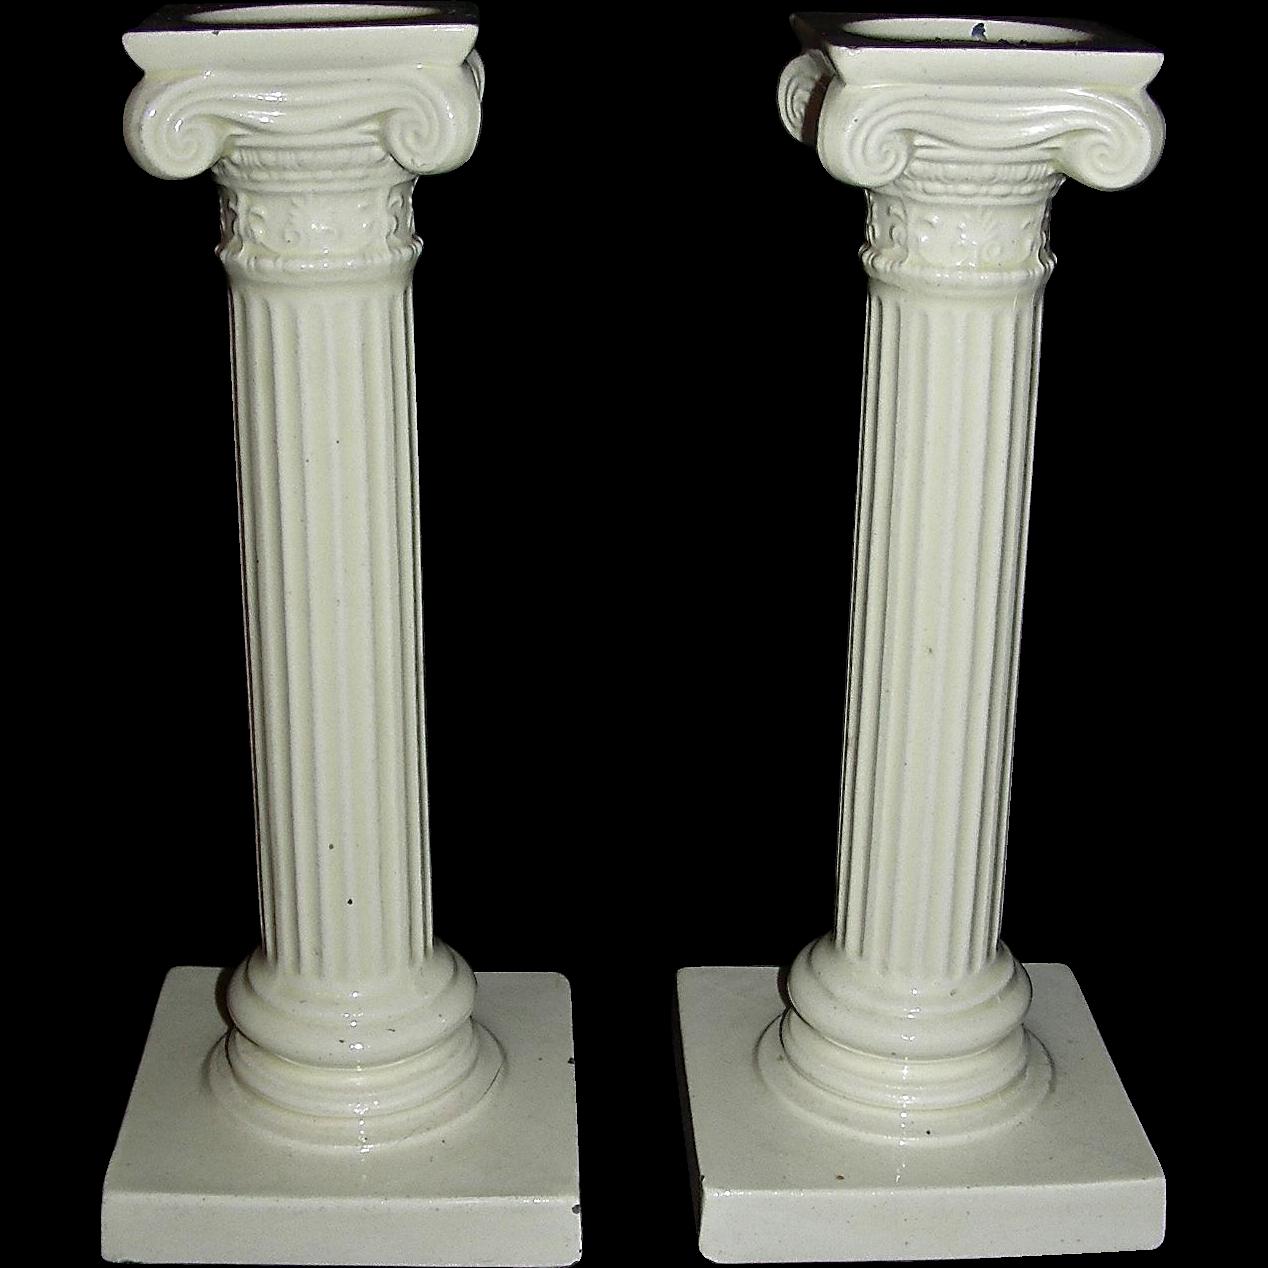 Pair of English Creamware Ionic Column Candlesticks, c. 1875